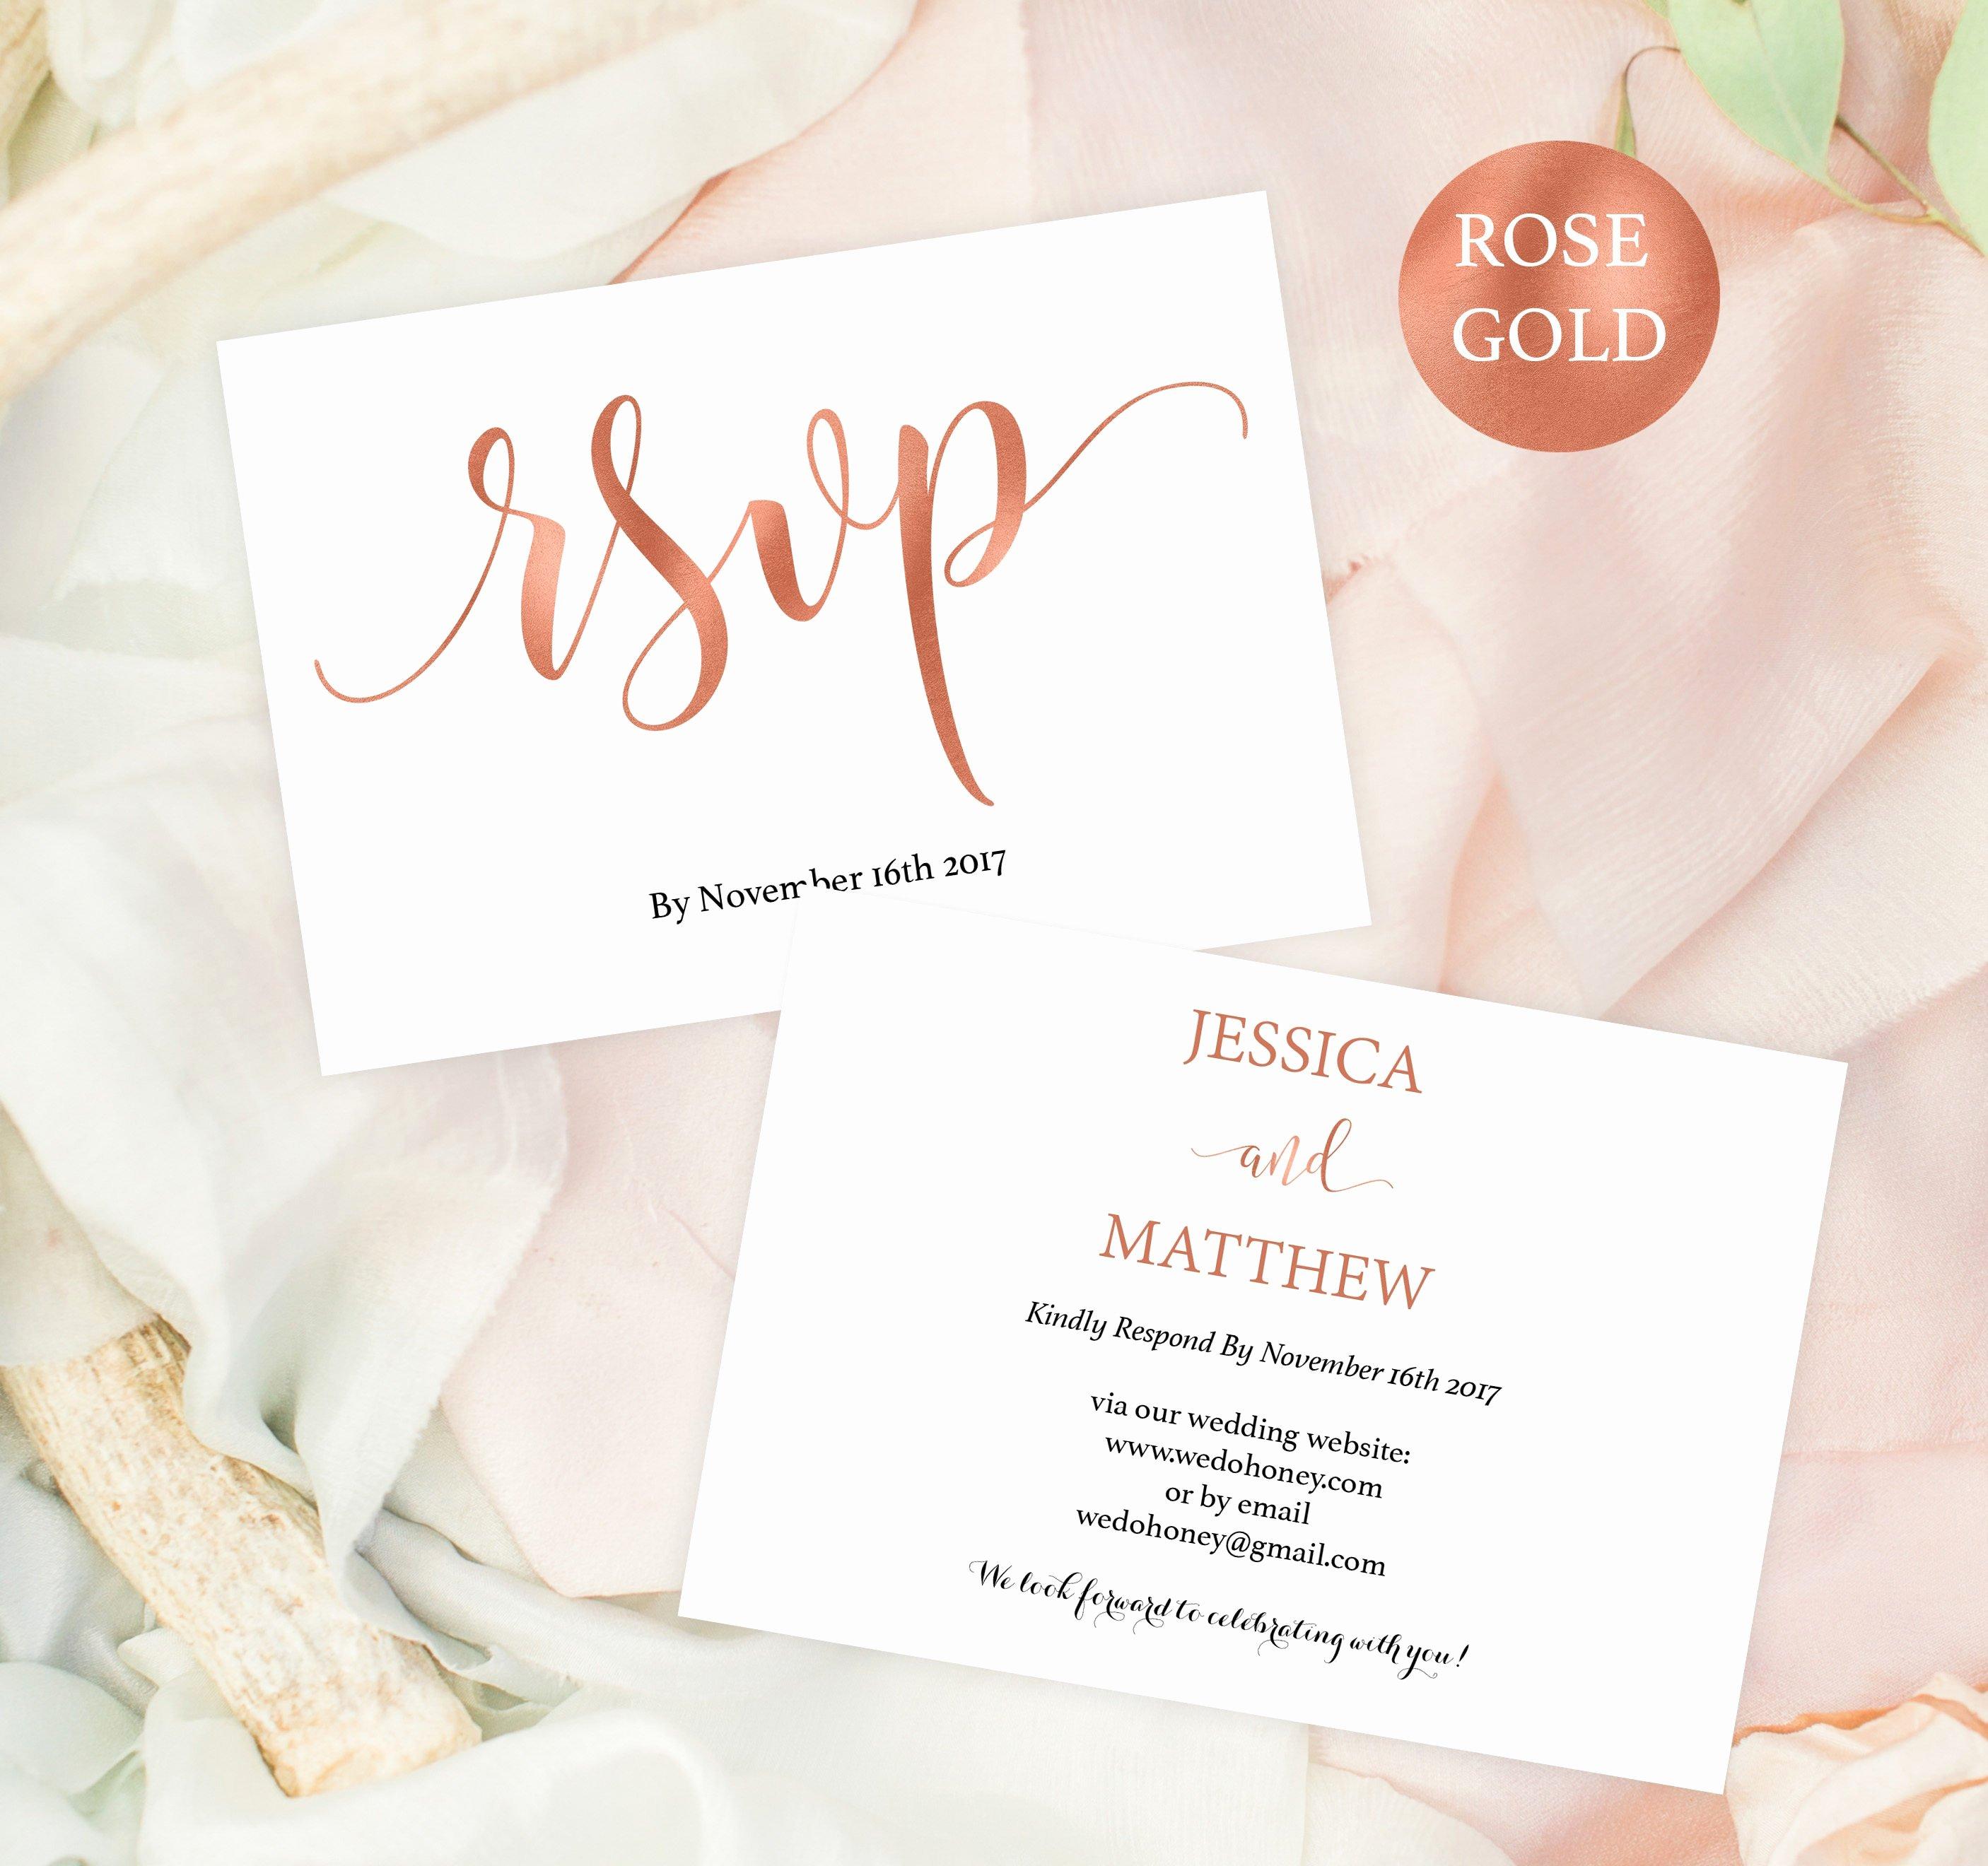 Wedding Rsvp Cards Template Beautiful Wedding Rsvp Postcard Rsvp Template Rsvp Online Rose